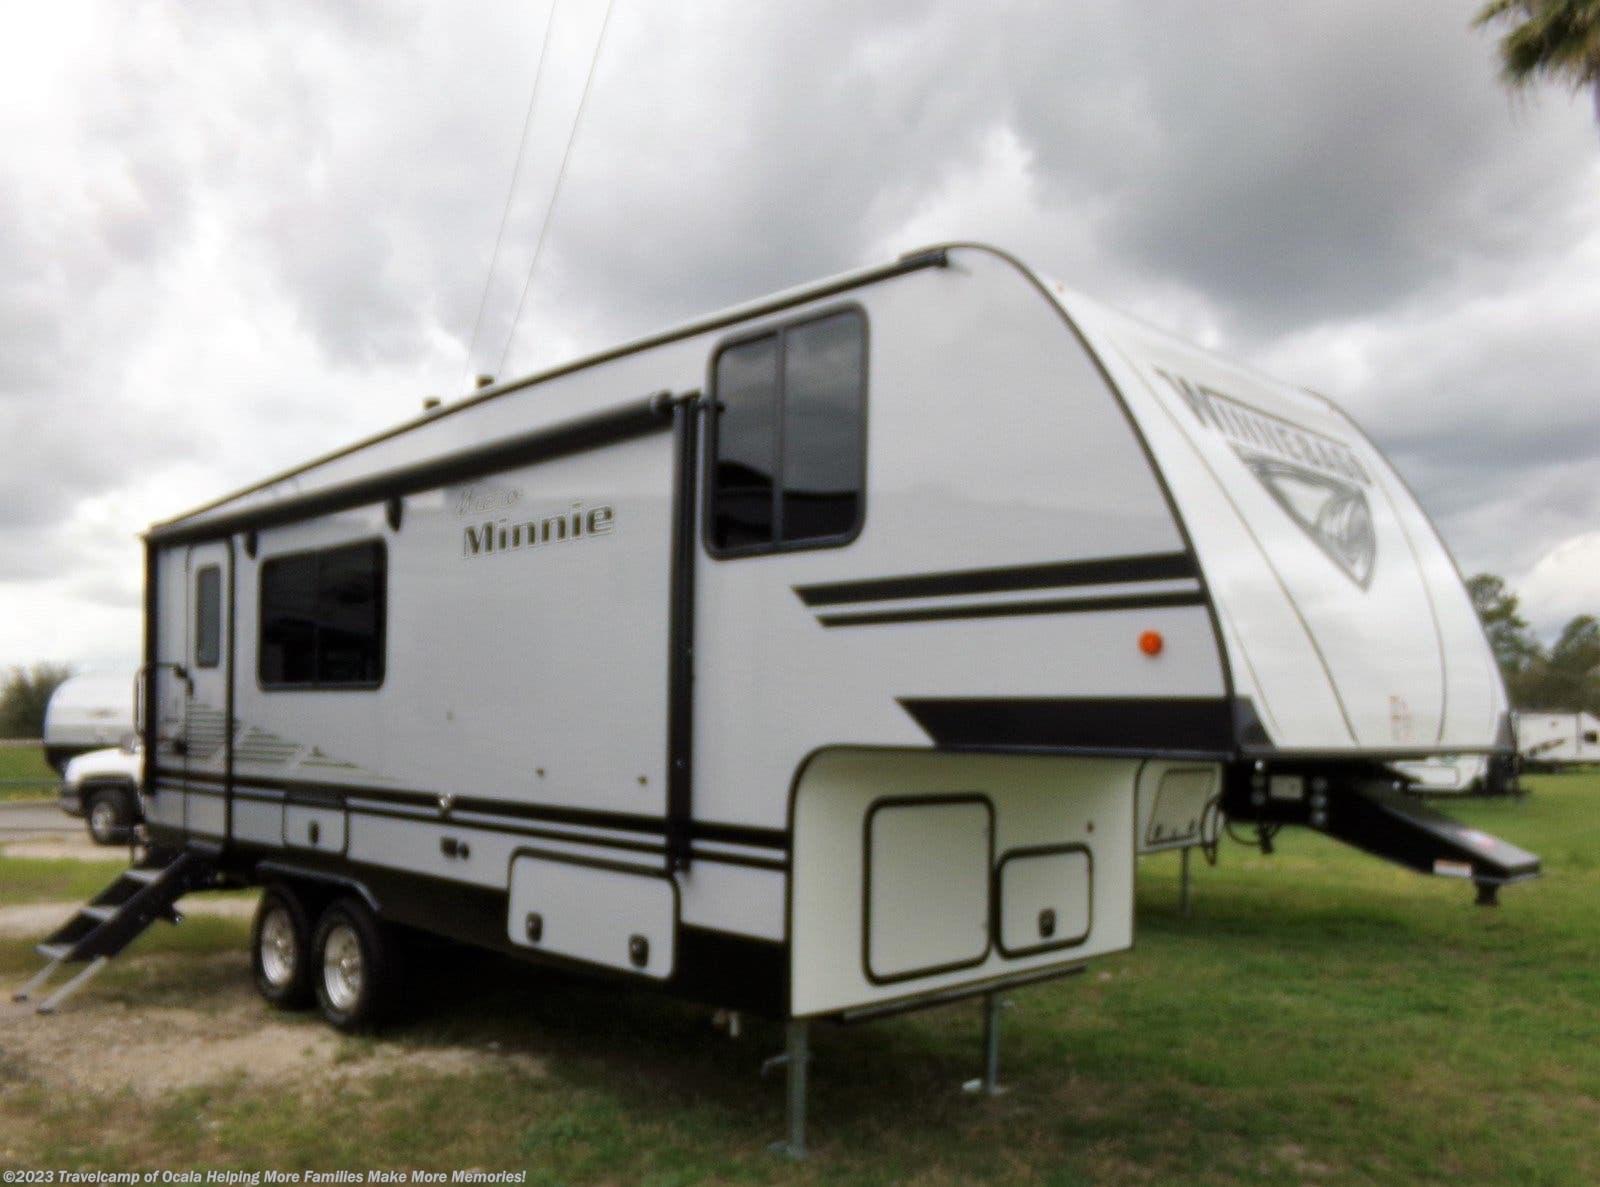 2020 Winnebago RV Micro Minnie for Sale in Summerfield, FL 34491 | WBMM46163